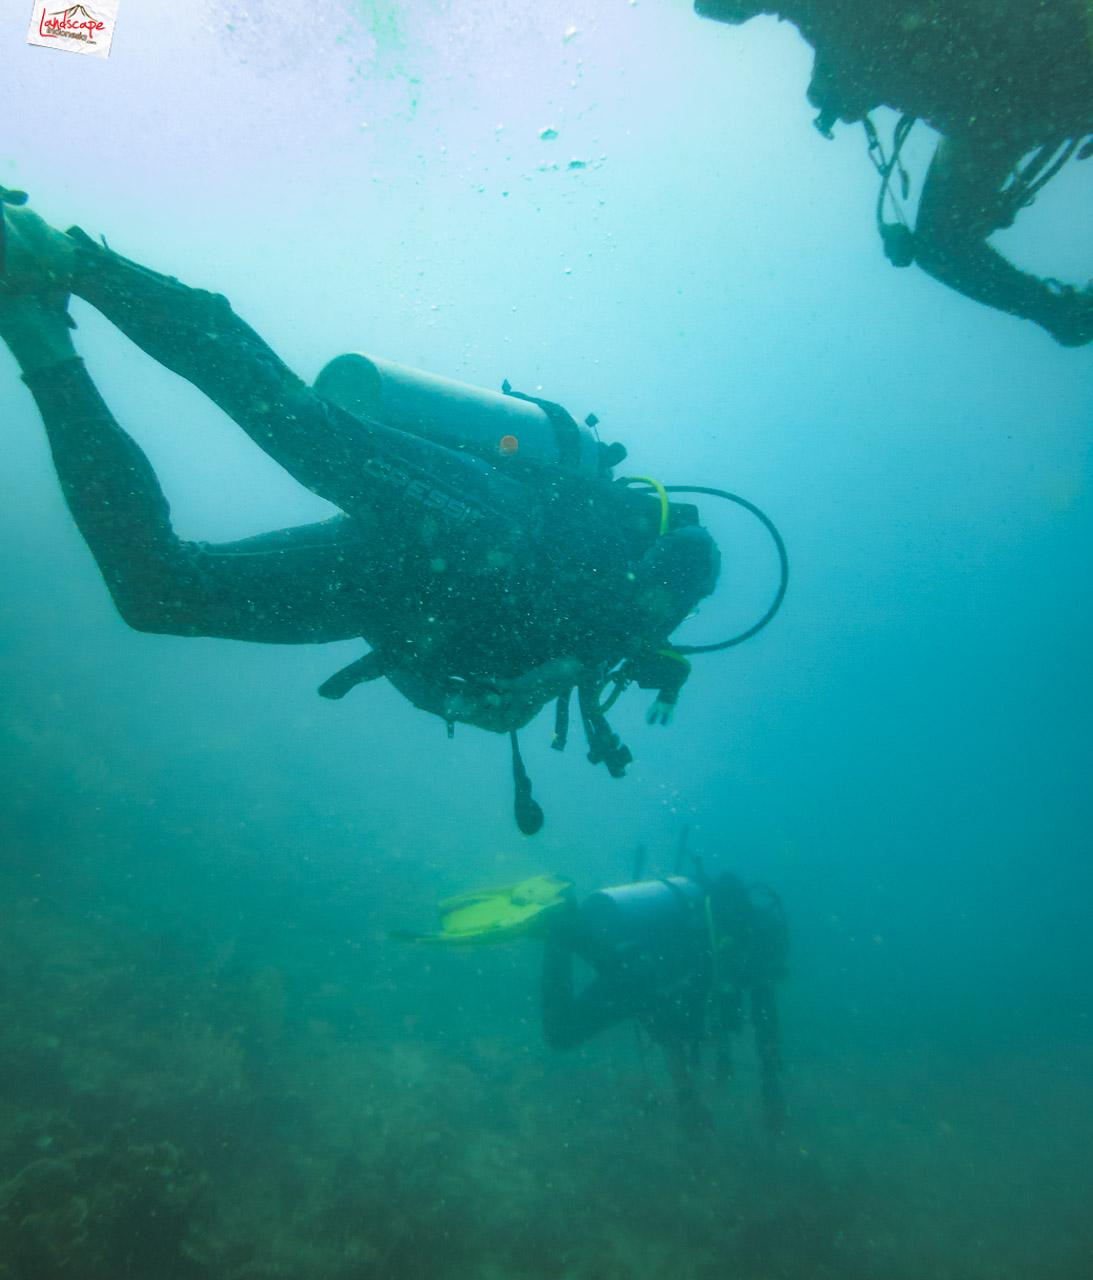 wreck dive kapal ahok 3 - Wreck Dive Kapal Ahok